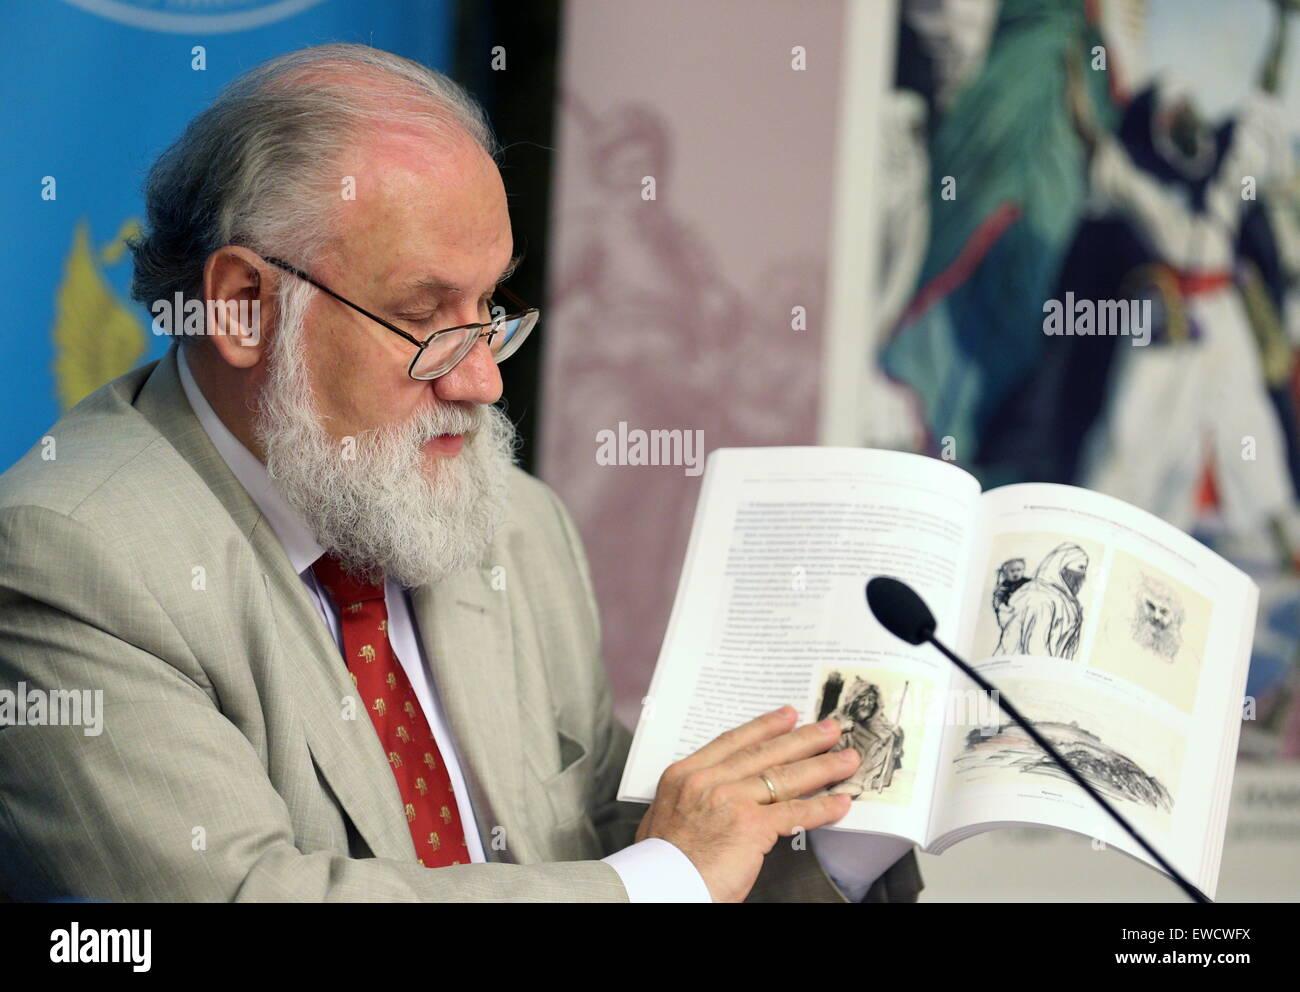 Churov Vladimir: biography and photos